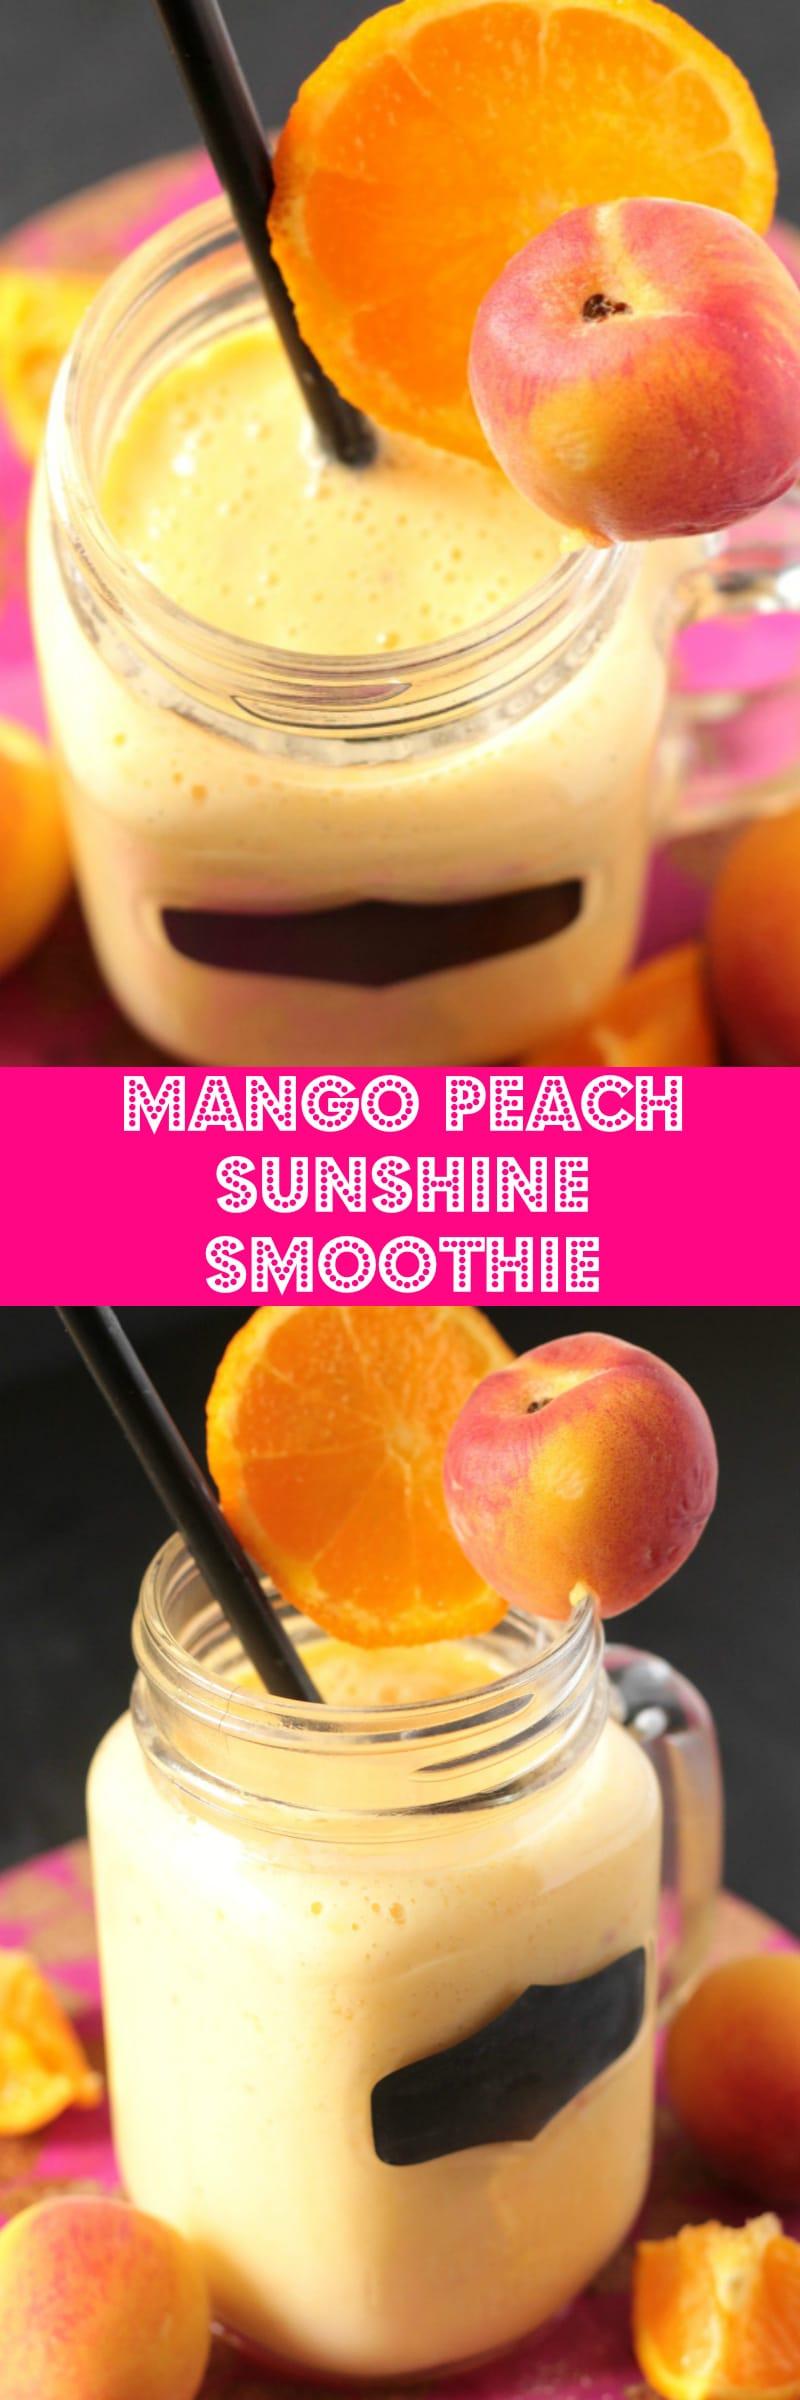 Mango Peach Sunshine Smoothie